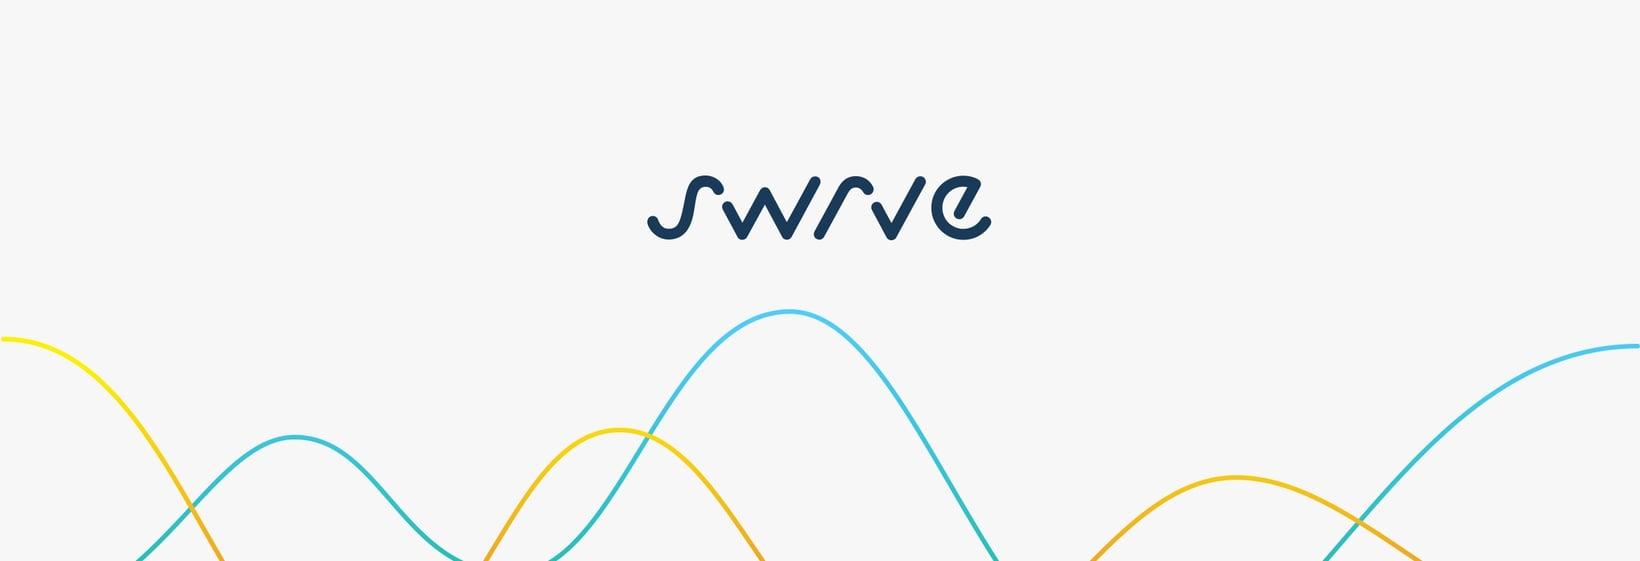 swrve-listing